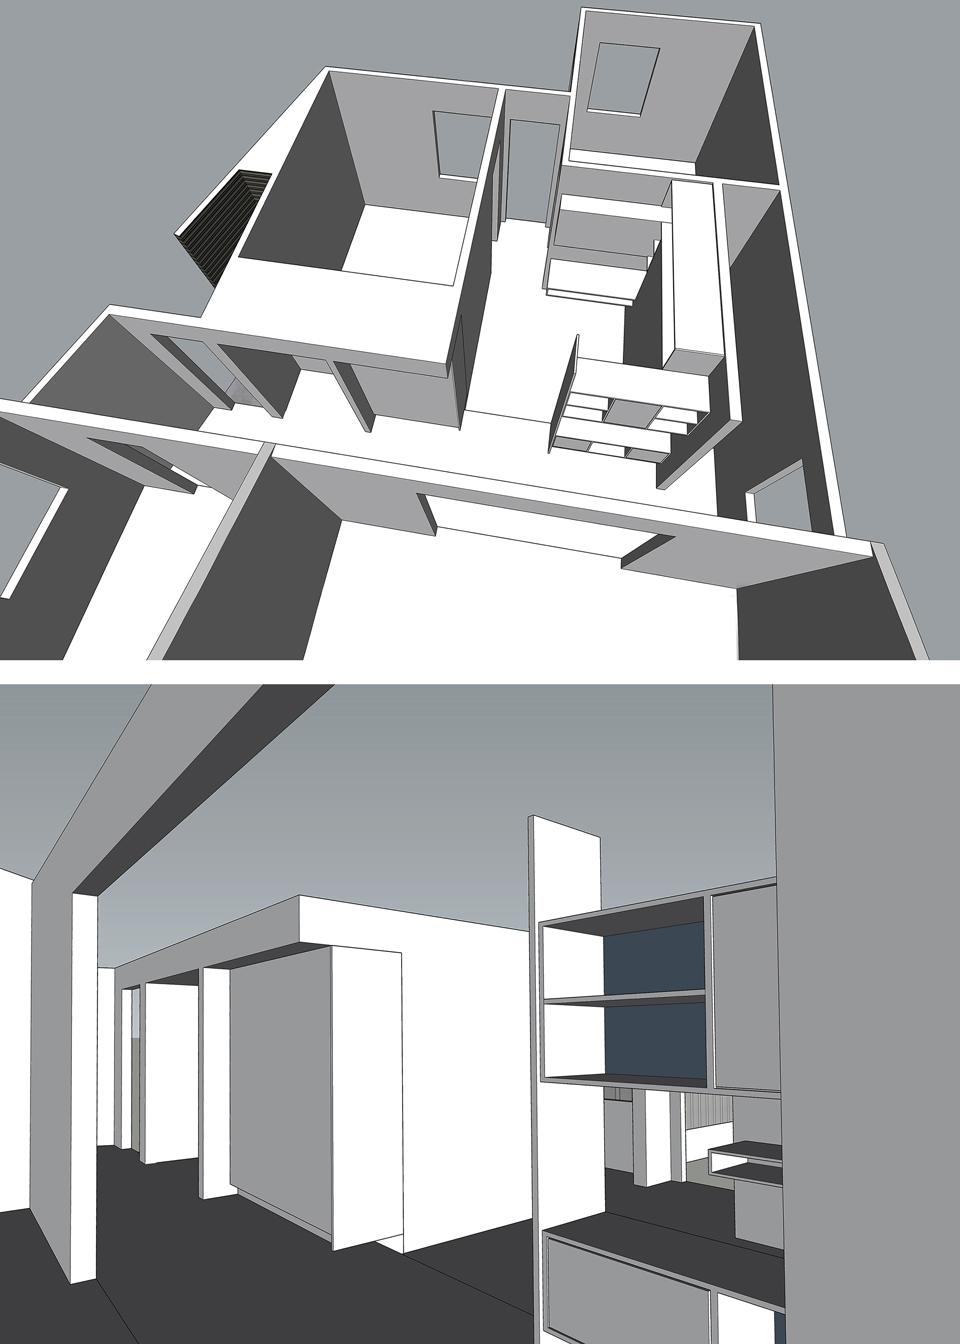 floor plan section // interior perspective